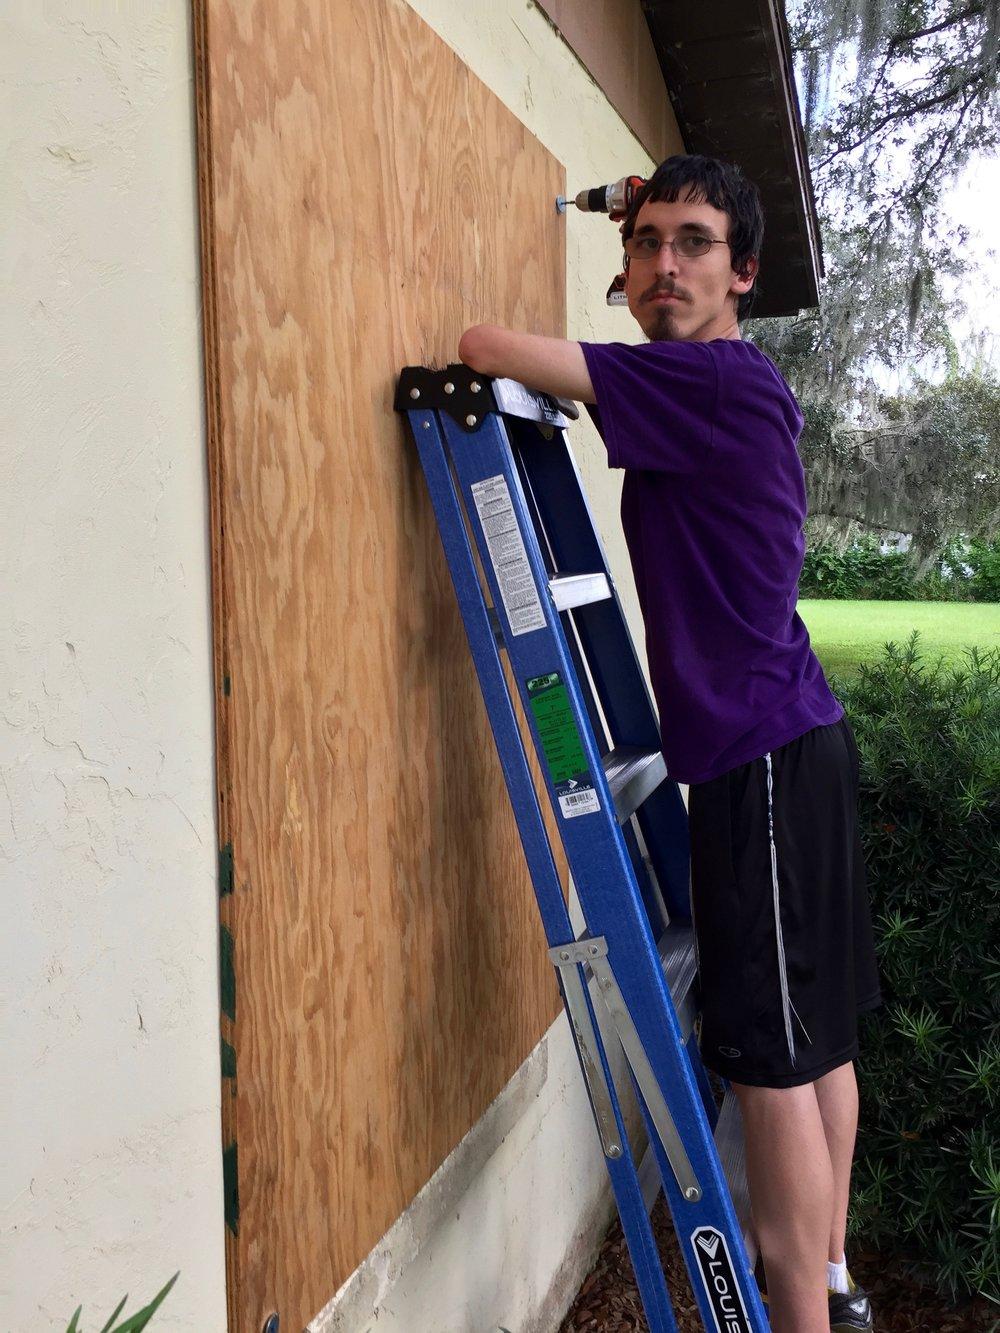 Mihai Marston boards a window. (Glenn Marston)